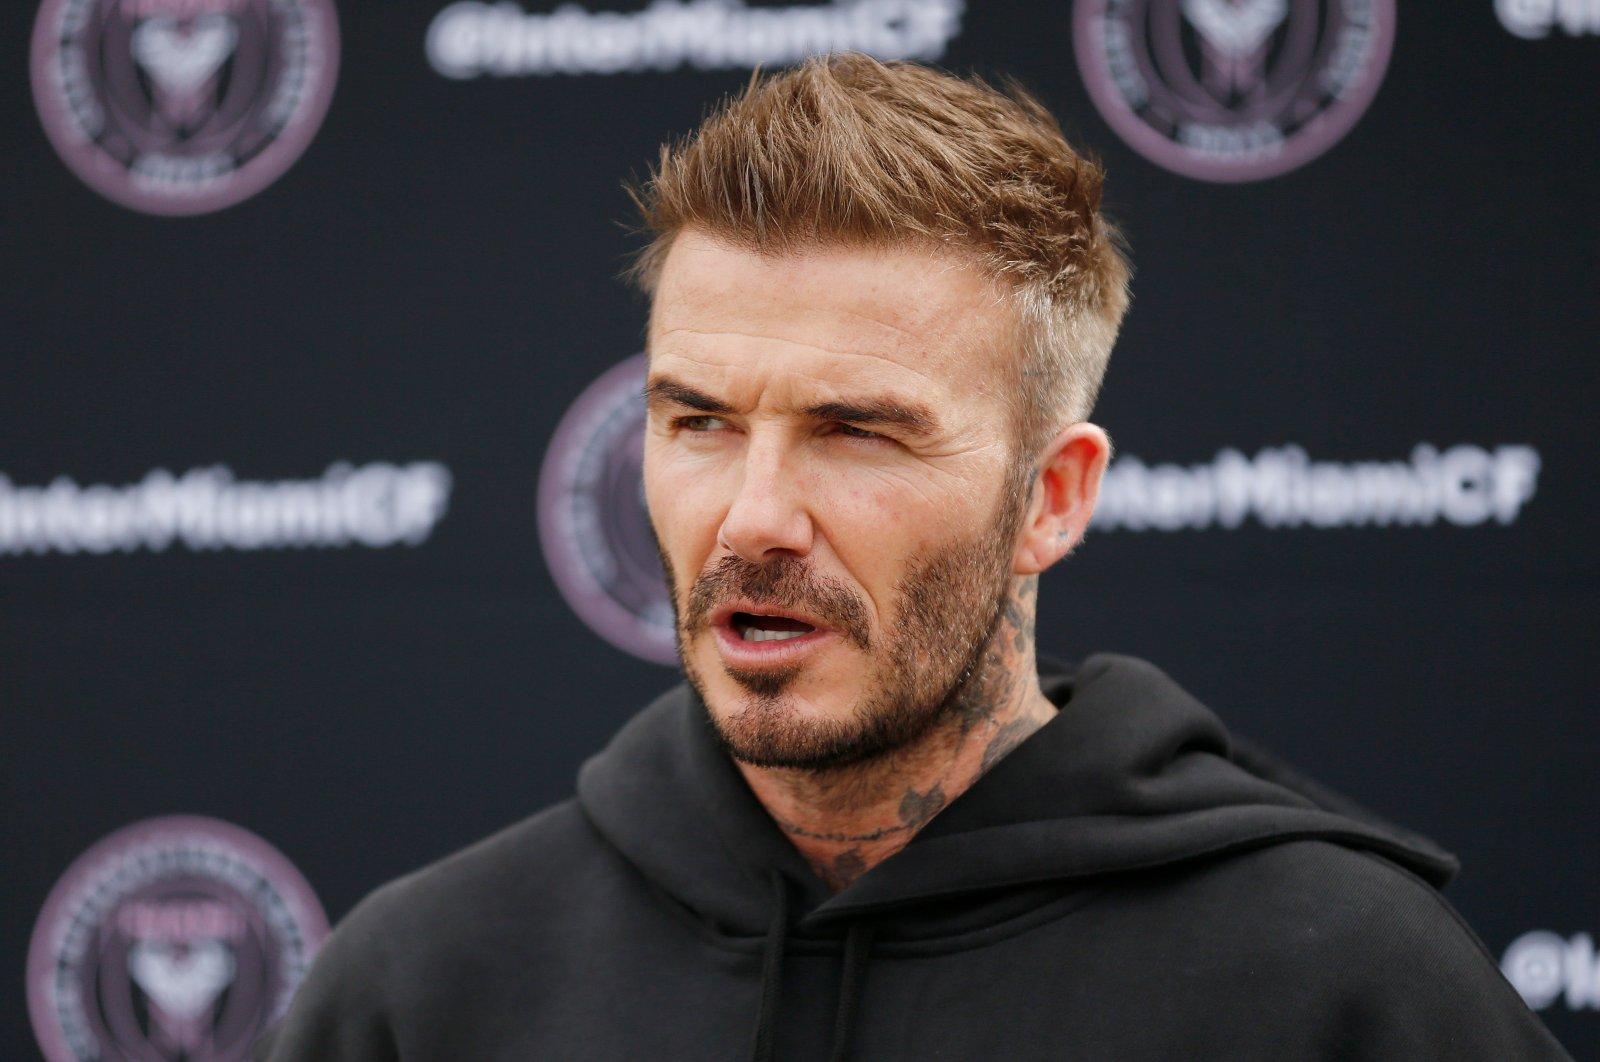 David Beckham speaks at a press event in Ft. Lauderdale, Fla., U.S., Feb. 24, 2020. (AFP Photo)